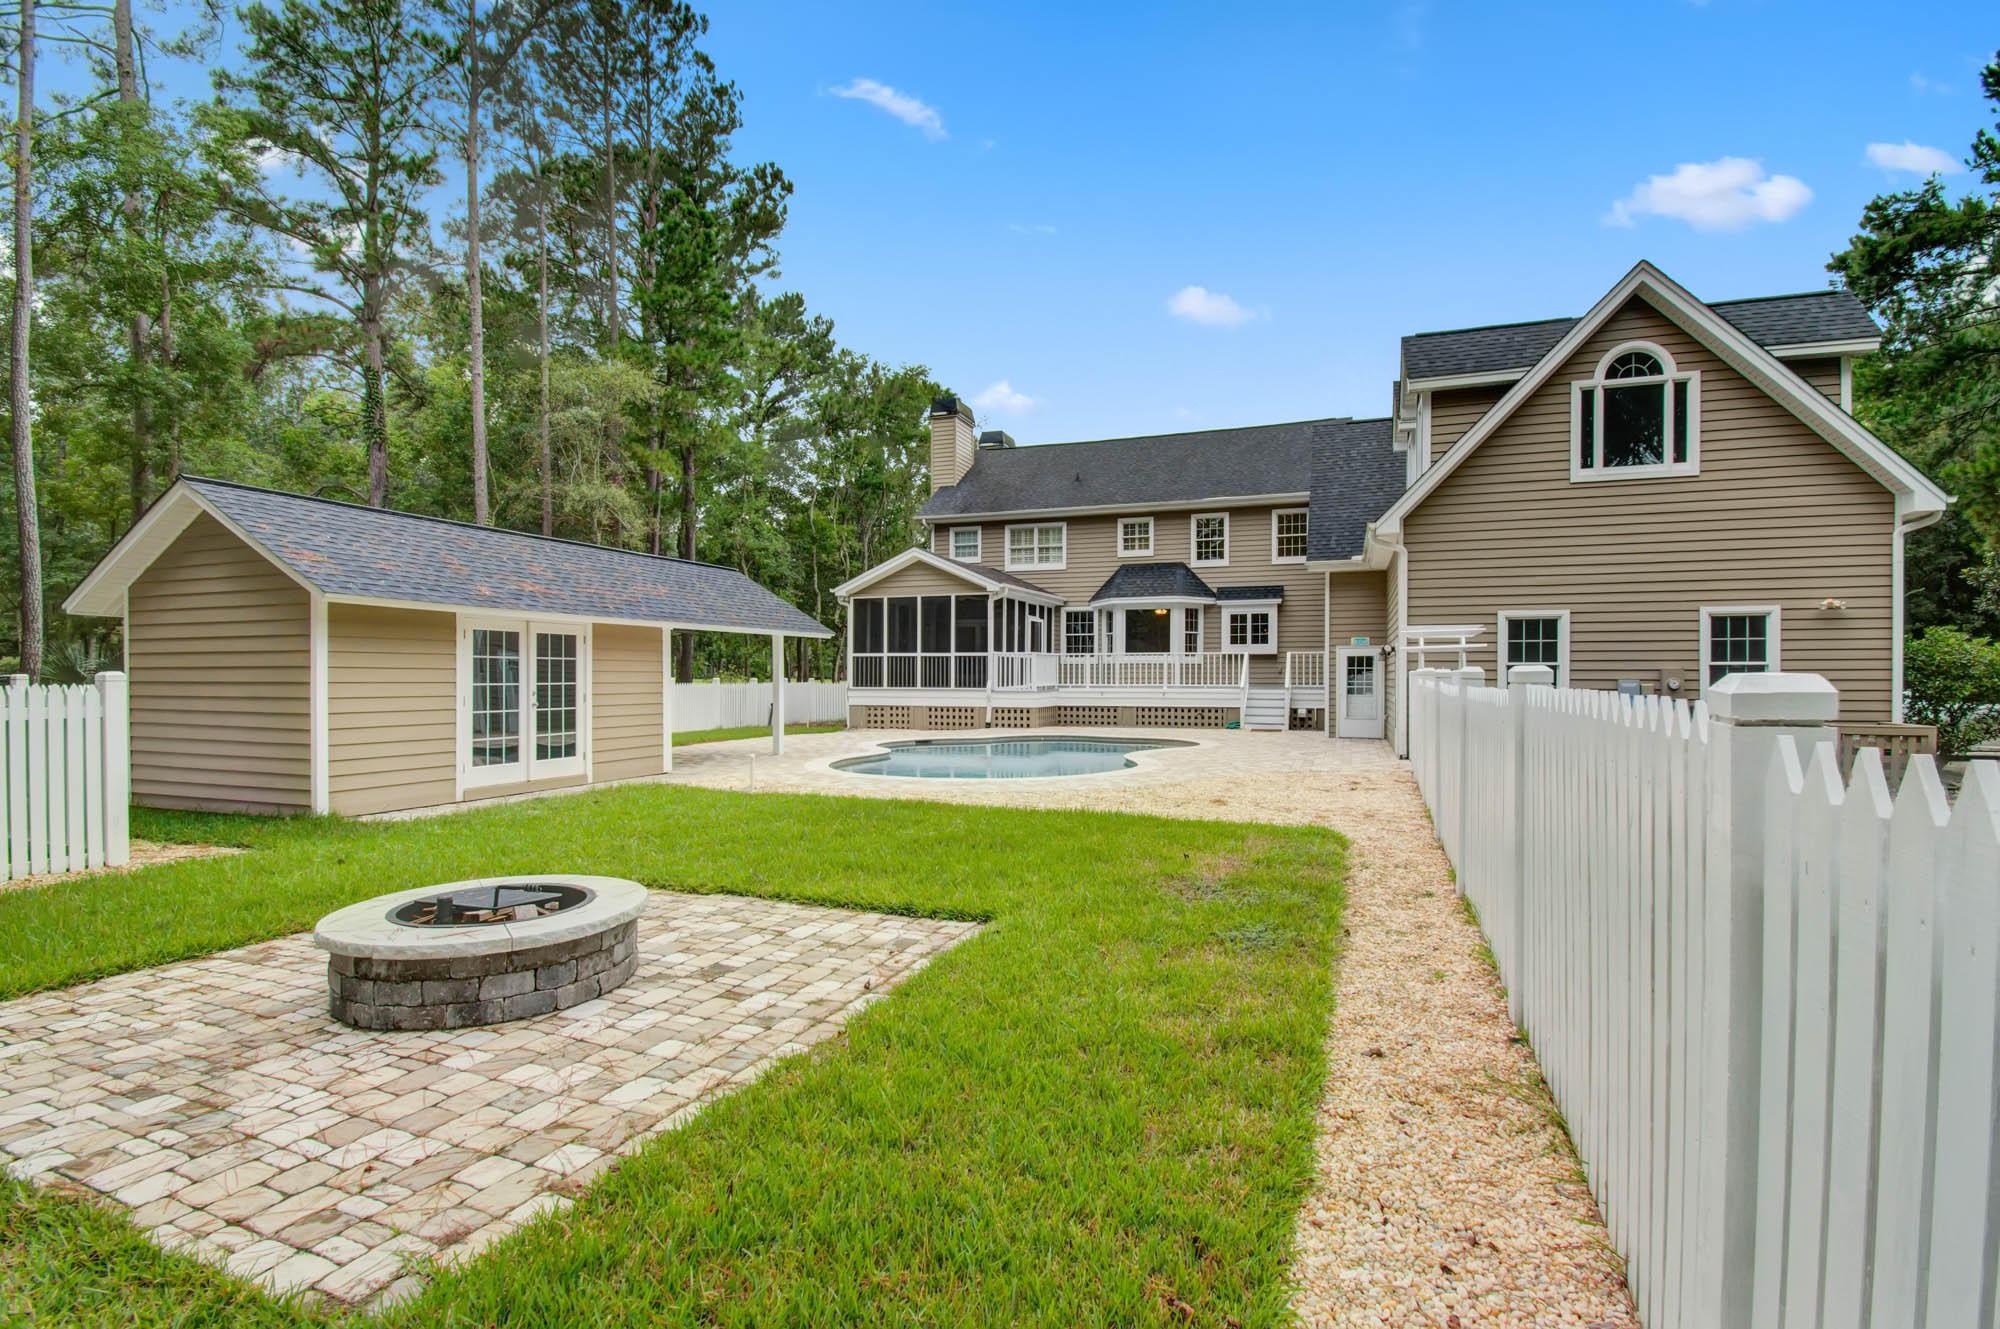 Dunes West Homes For Sale - 3515 Colonel Vanderhorst, Mount Pleasant, SC - 23